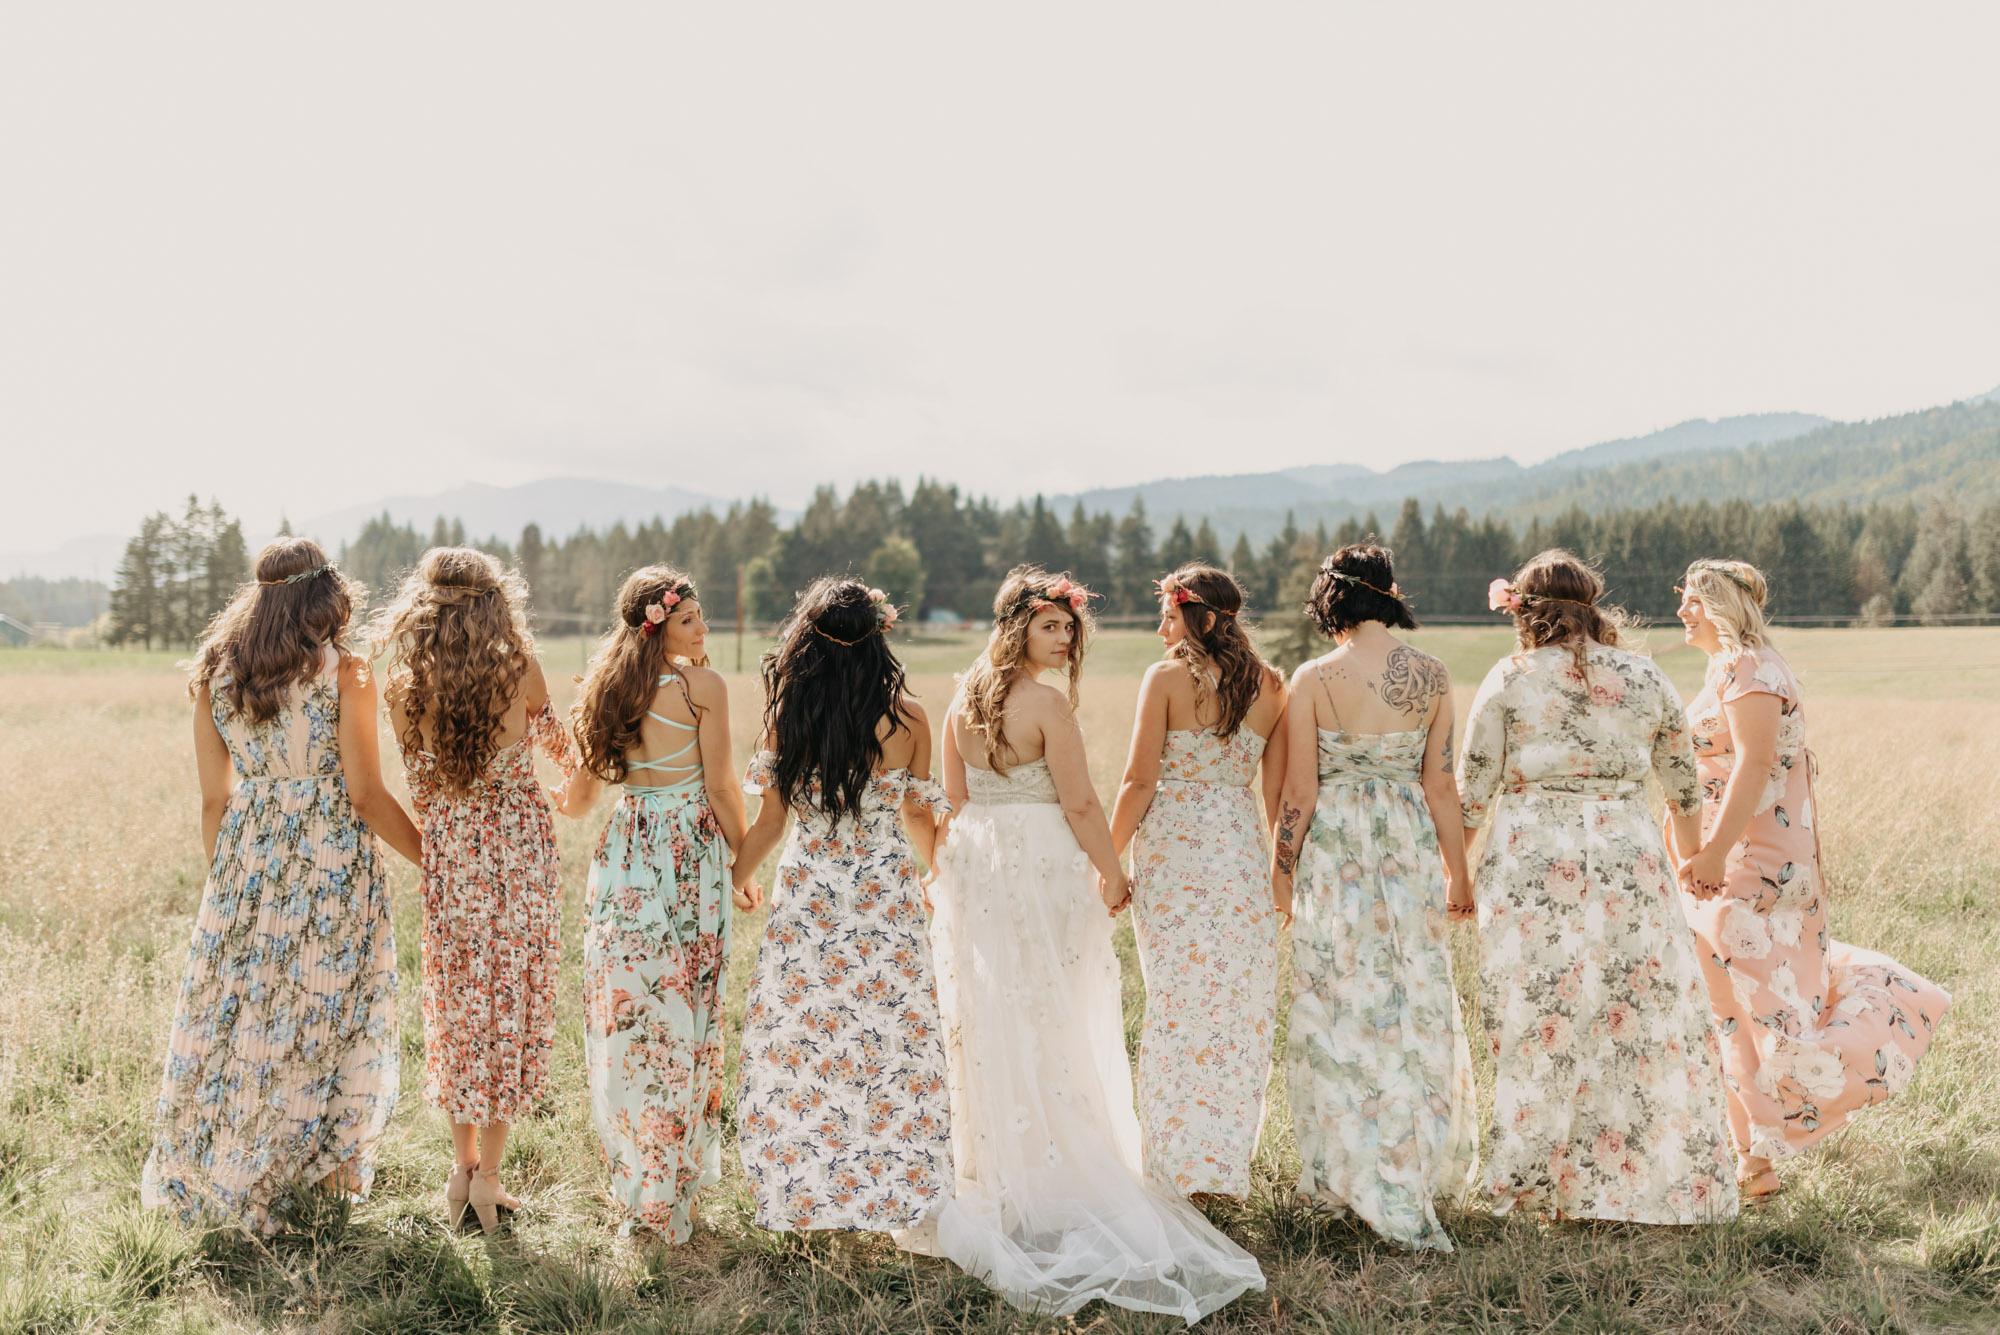 Bridal-Party-Free-People-Flower-Dresses-Washington-Wedding-8508.jpg